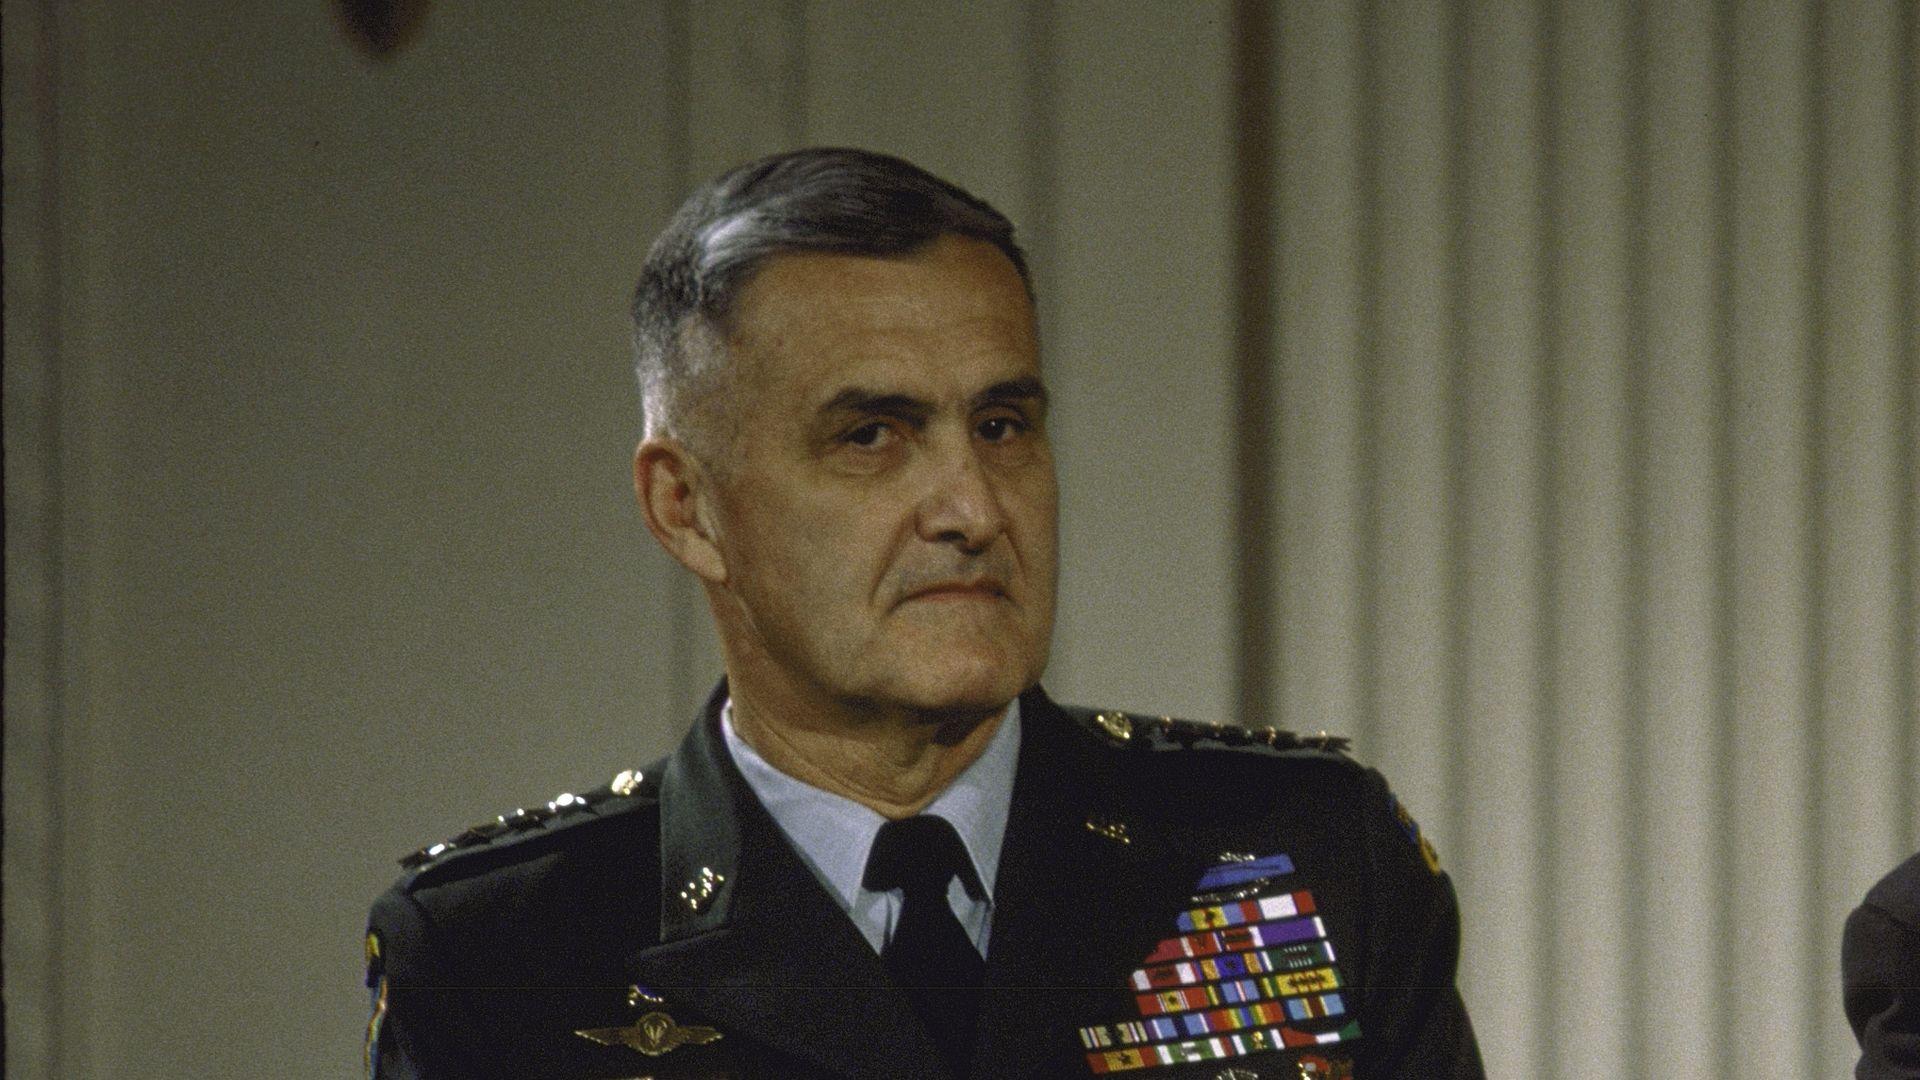 Hugh Shelton sits in uniform